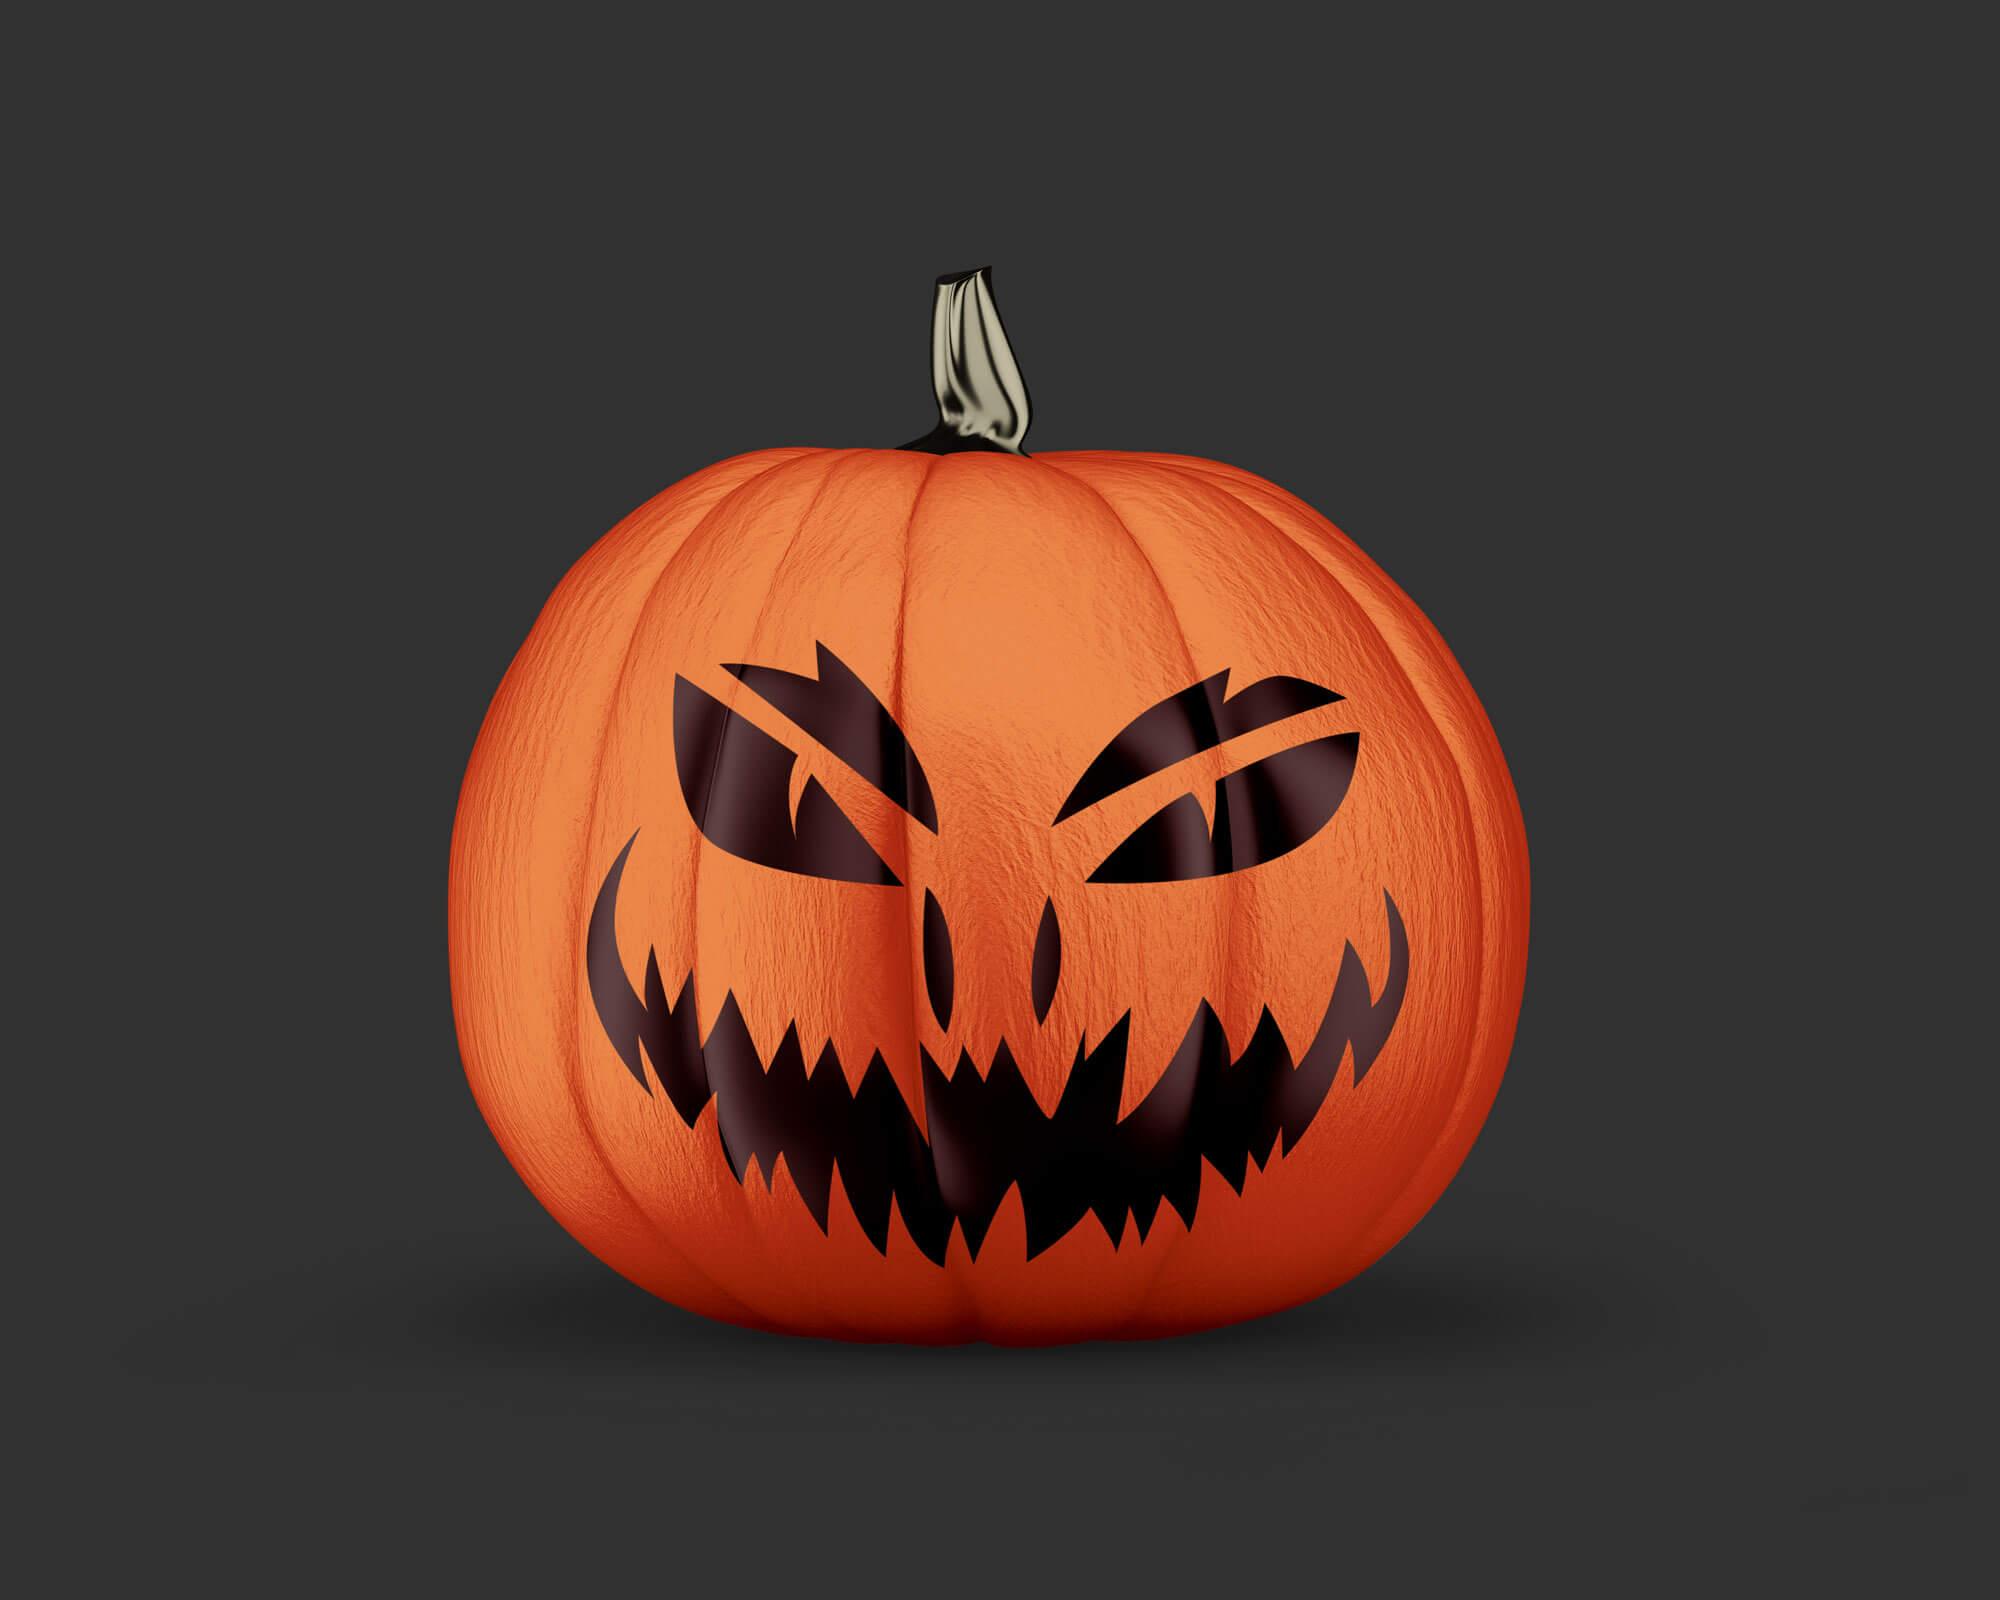 Free-Painted-Halloween-2020-Scary-Pumpkin-Mockup-PSD